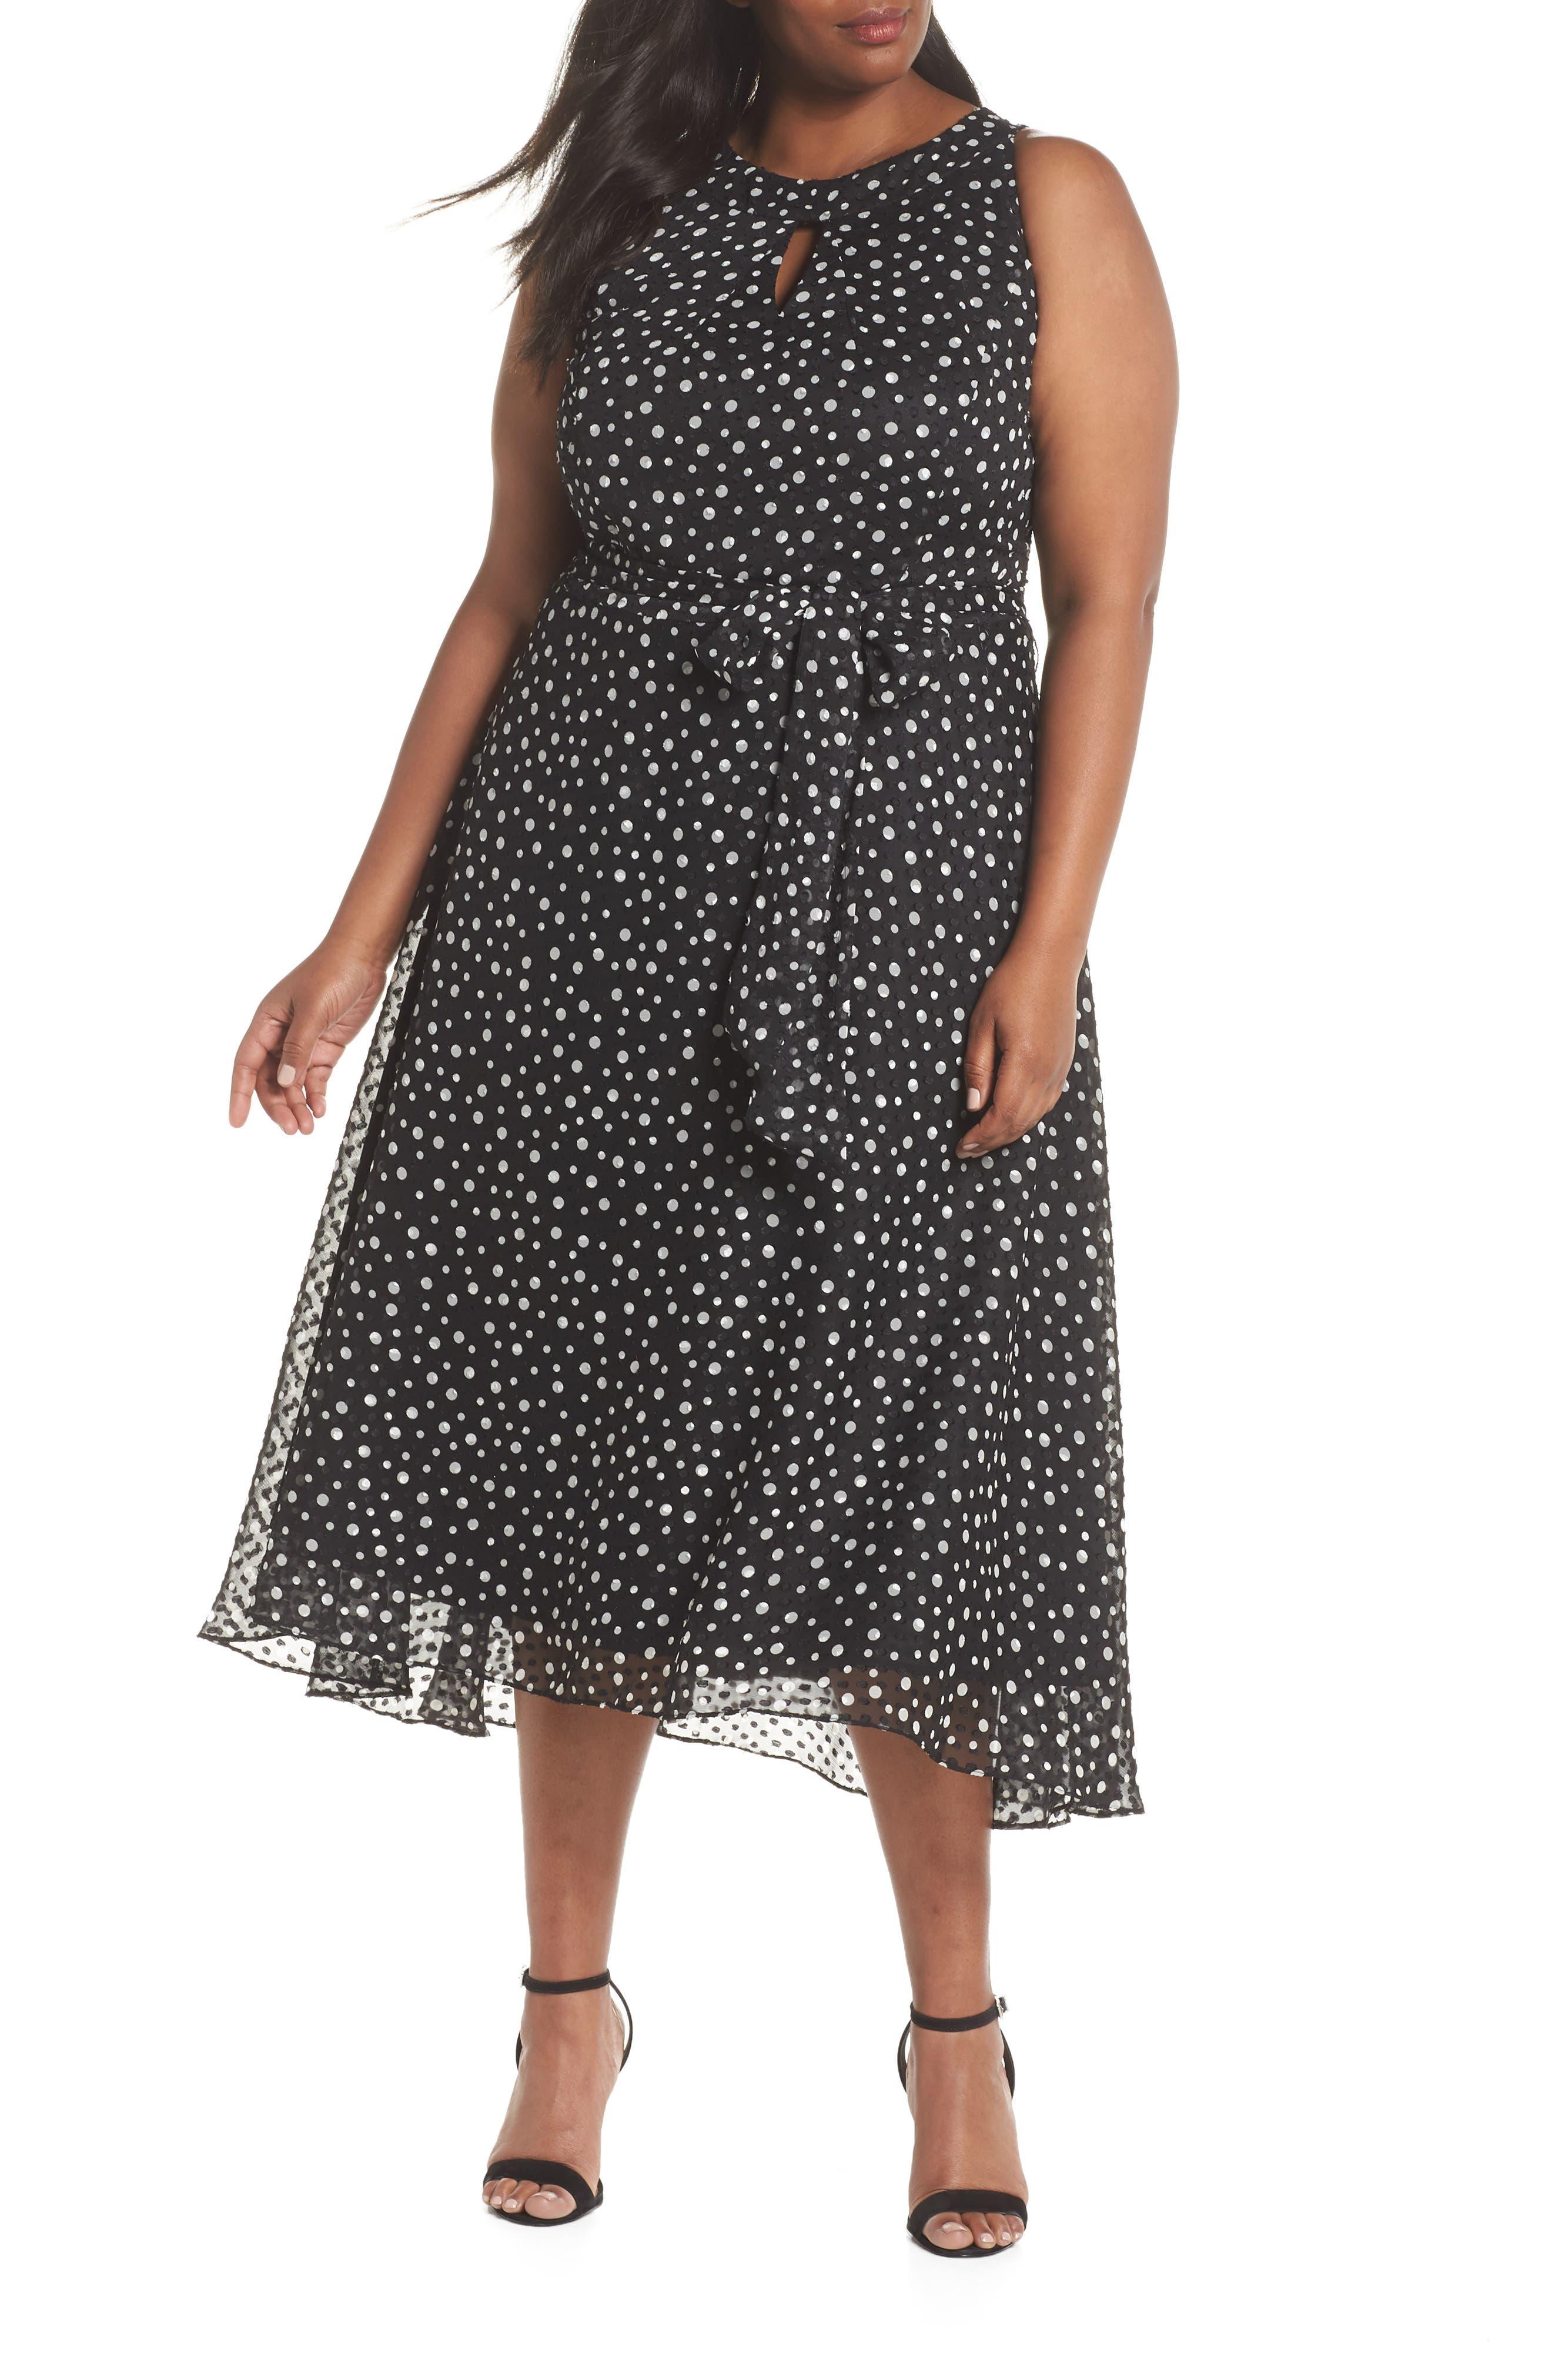 Polka Dot Keyhole Chiffon Dress,                             Main thumbnail 1, color,                             003